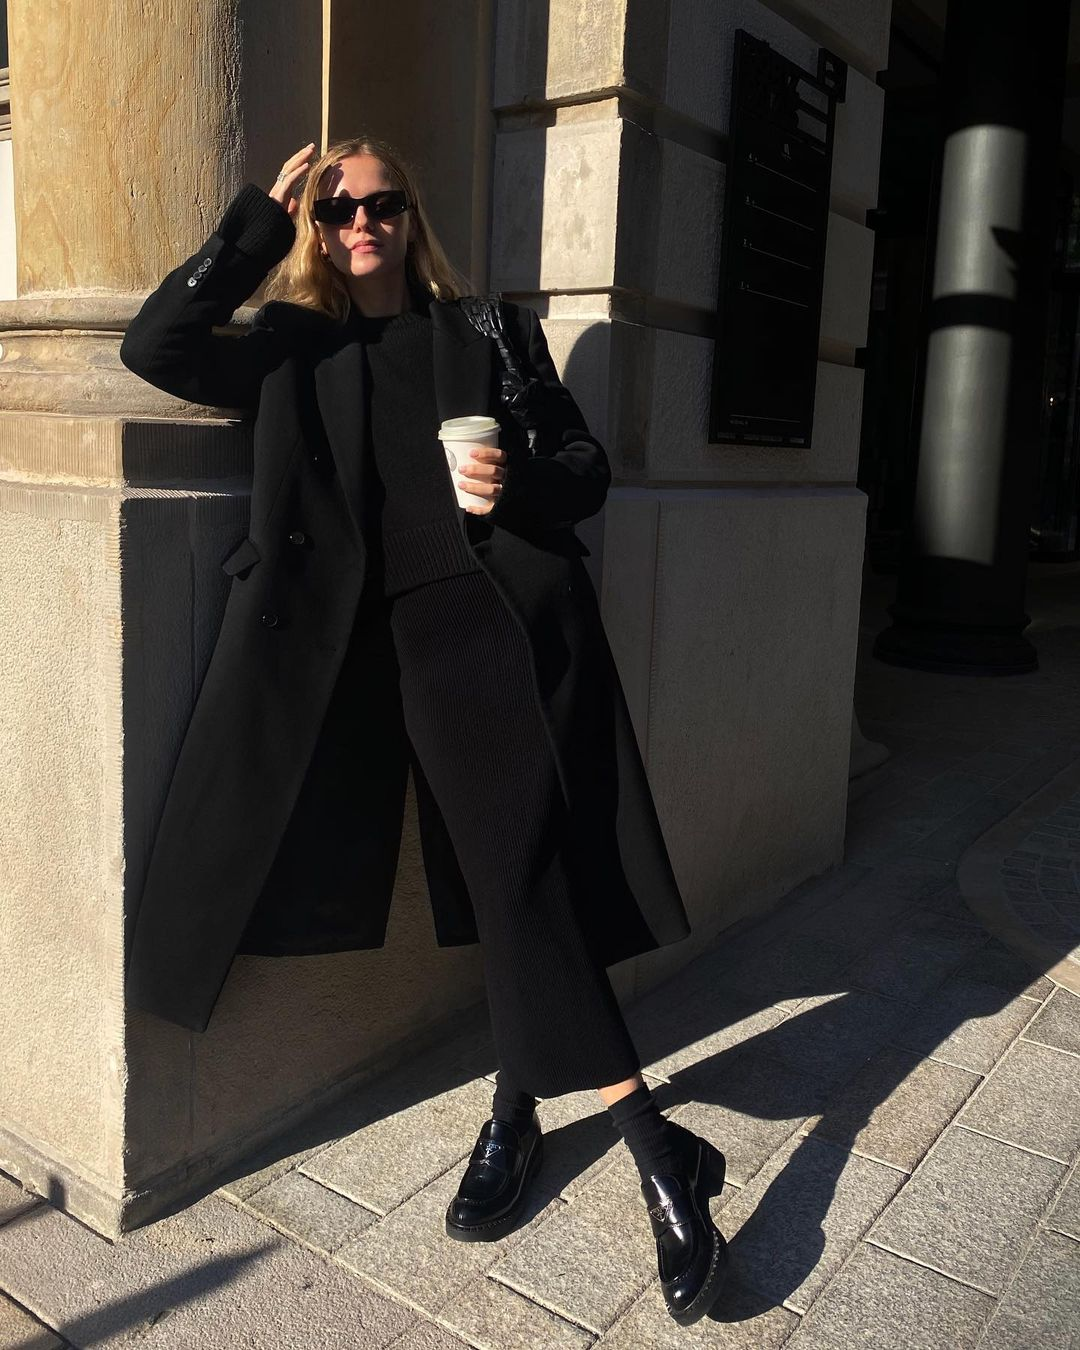 Black coat and black boots